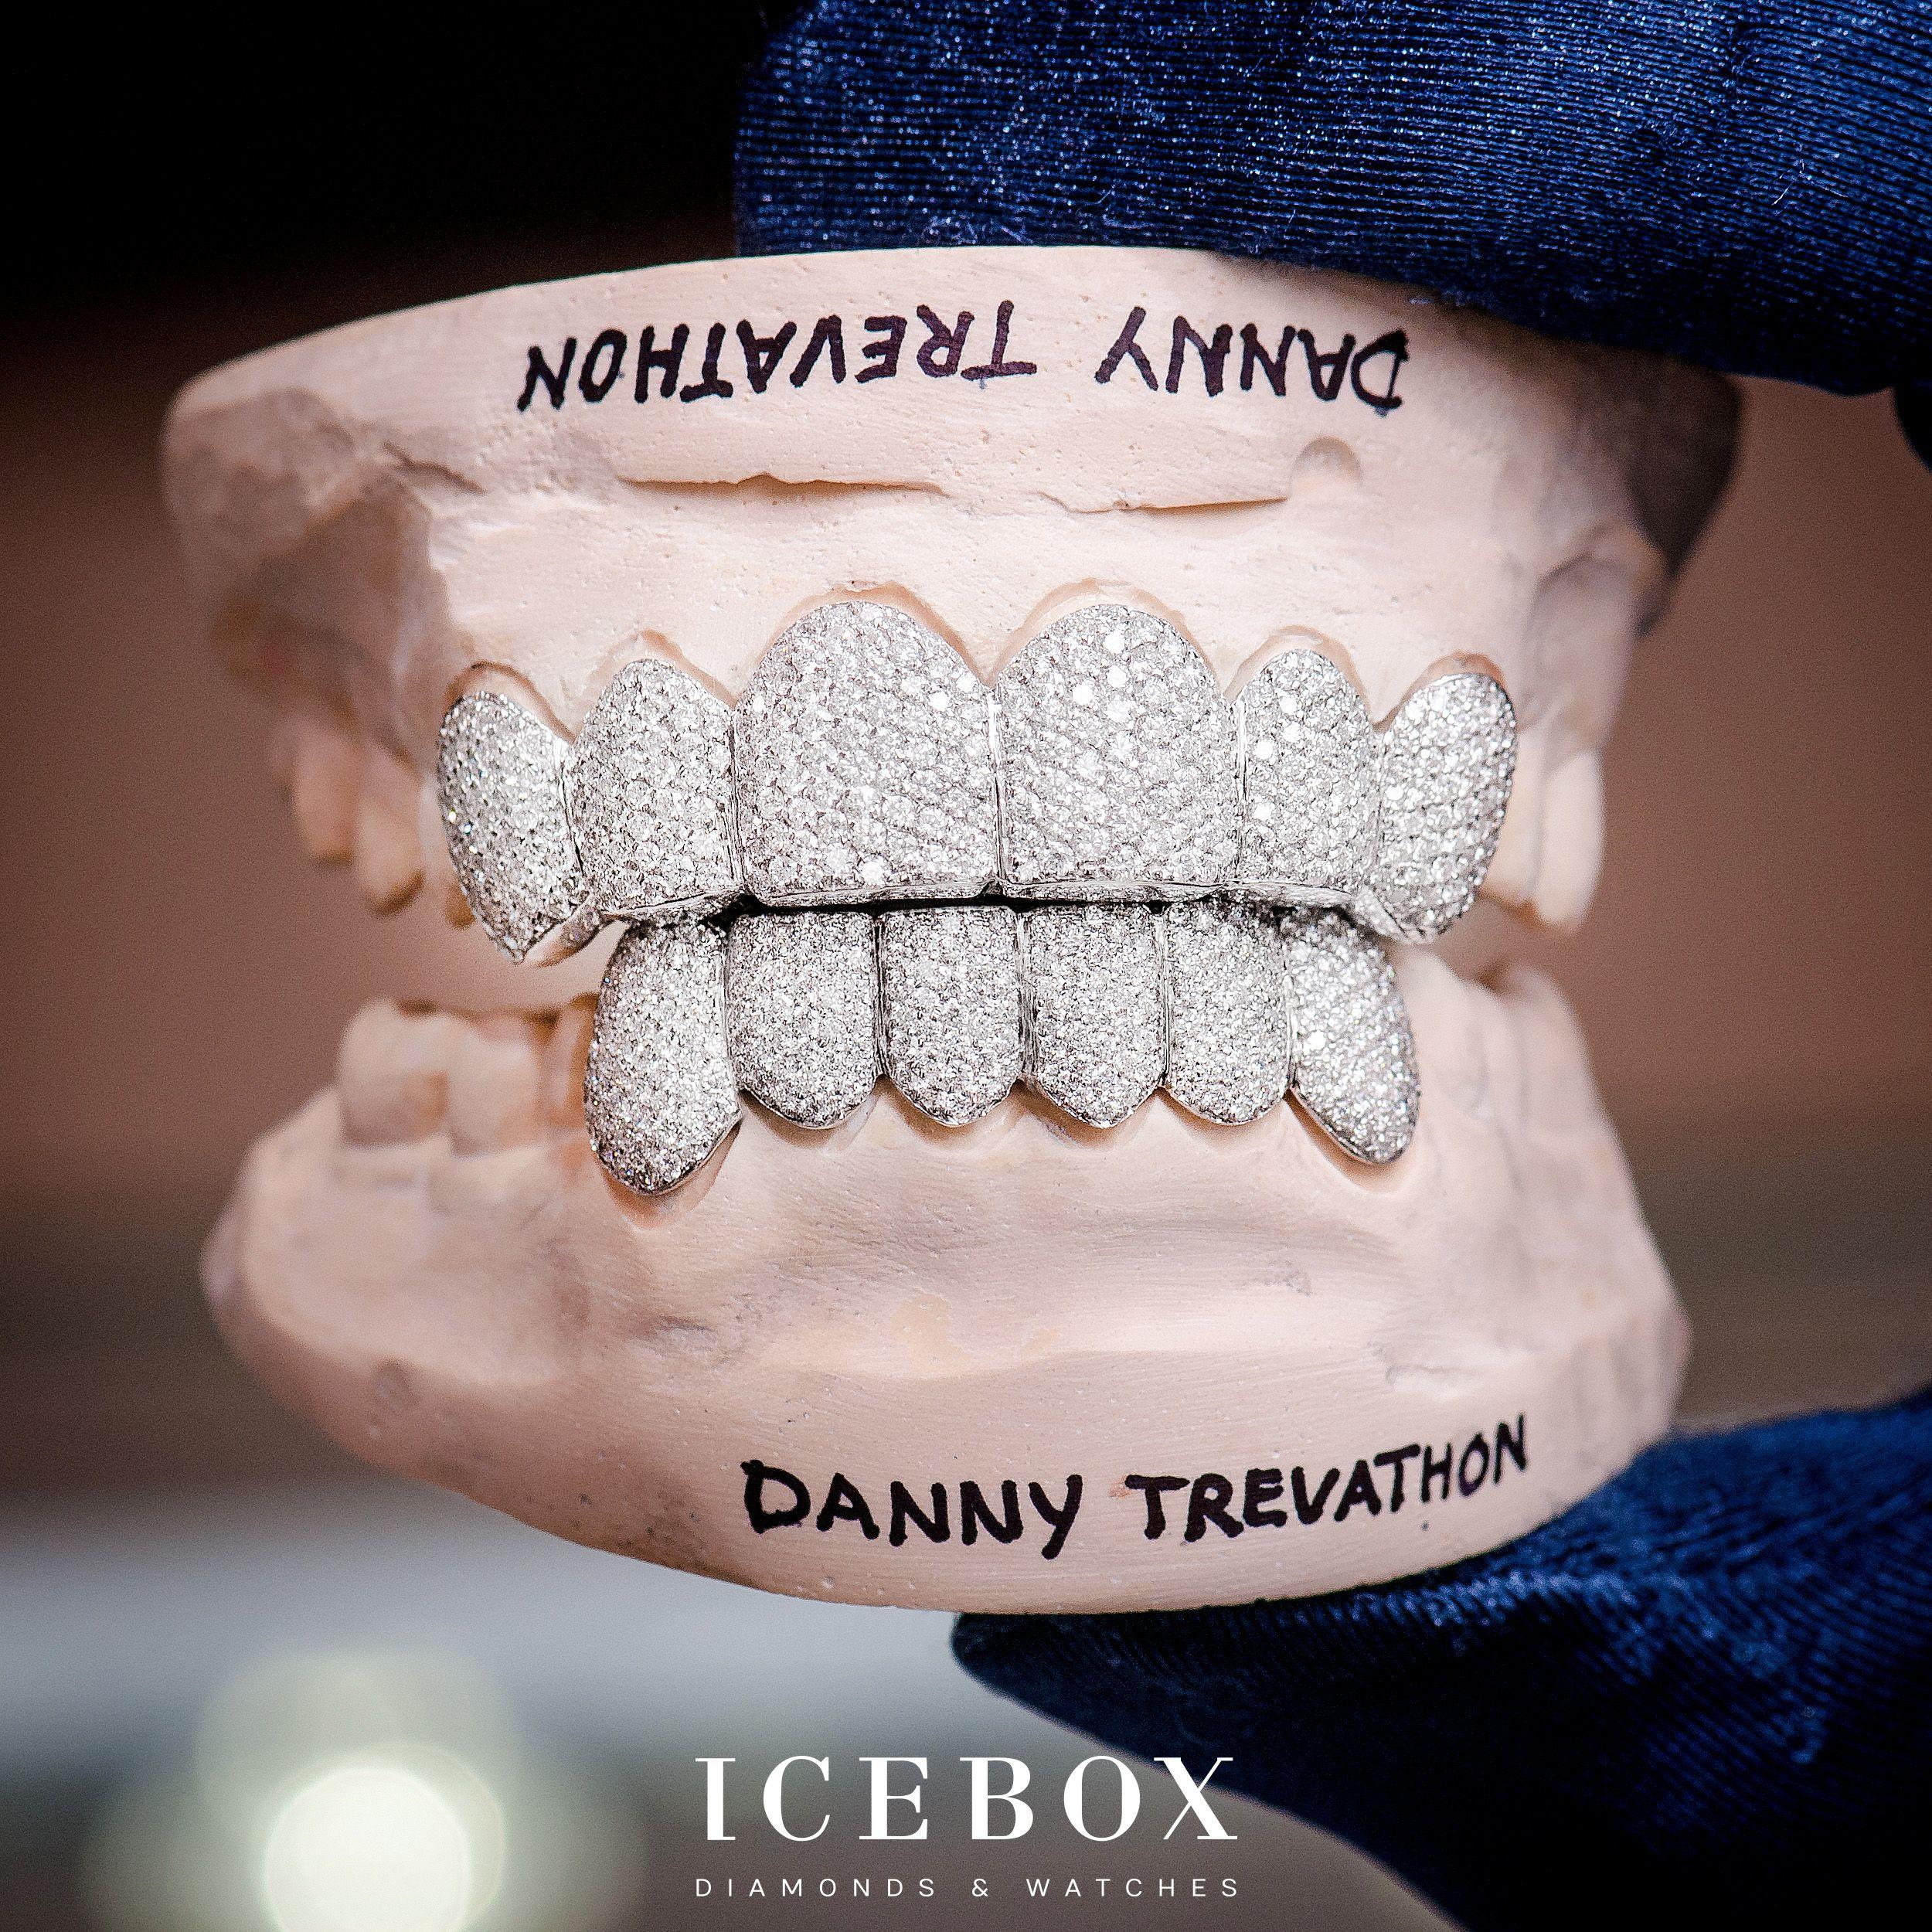 Pin By Icebox Diamonds Watches On Grillz Grillz Diamond Grillz Teeth Jewelry